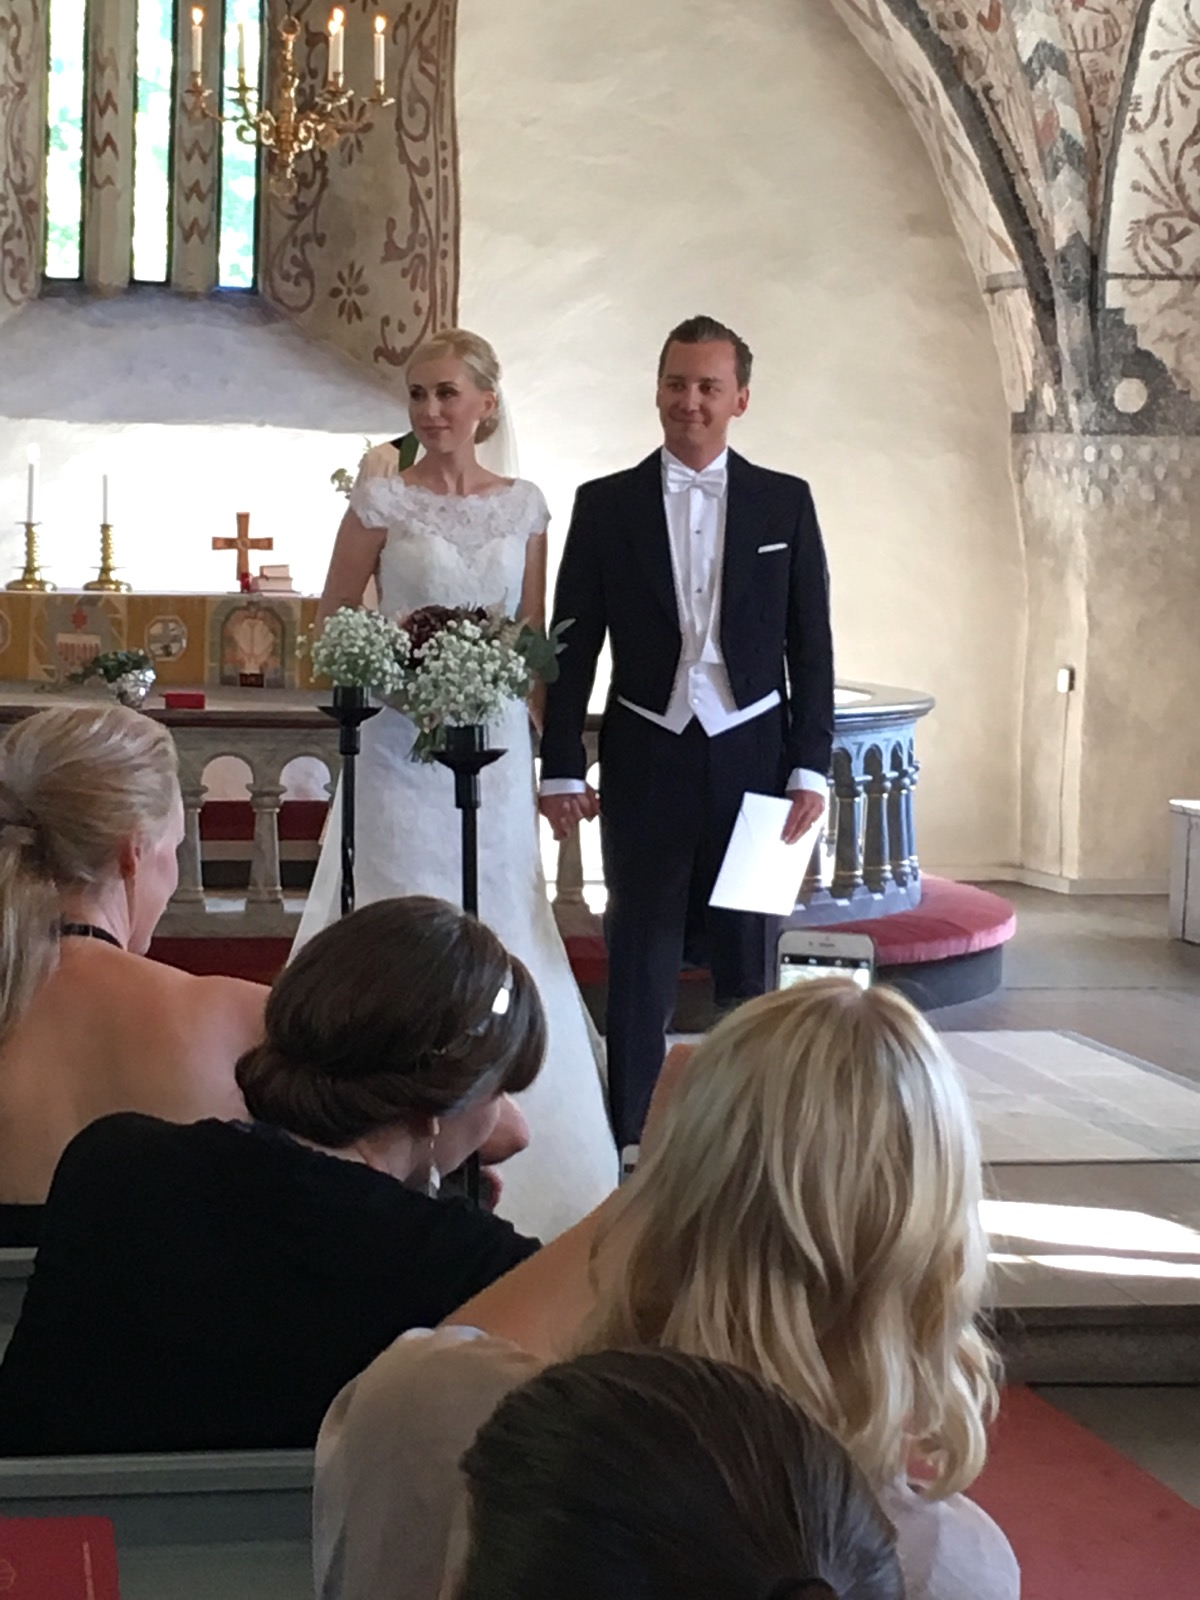 annaochgustav|skonhetssnack.se